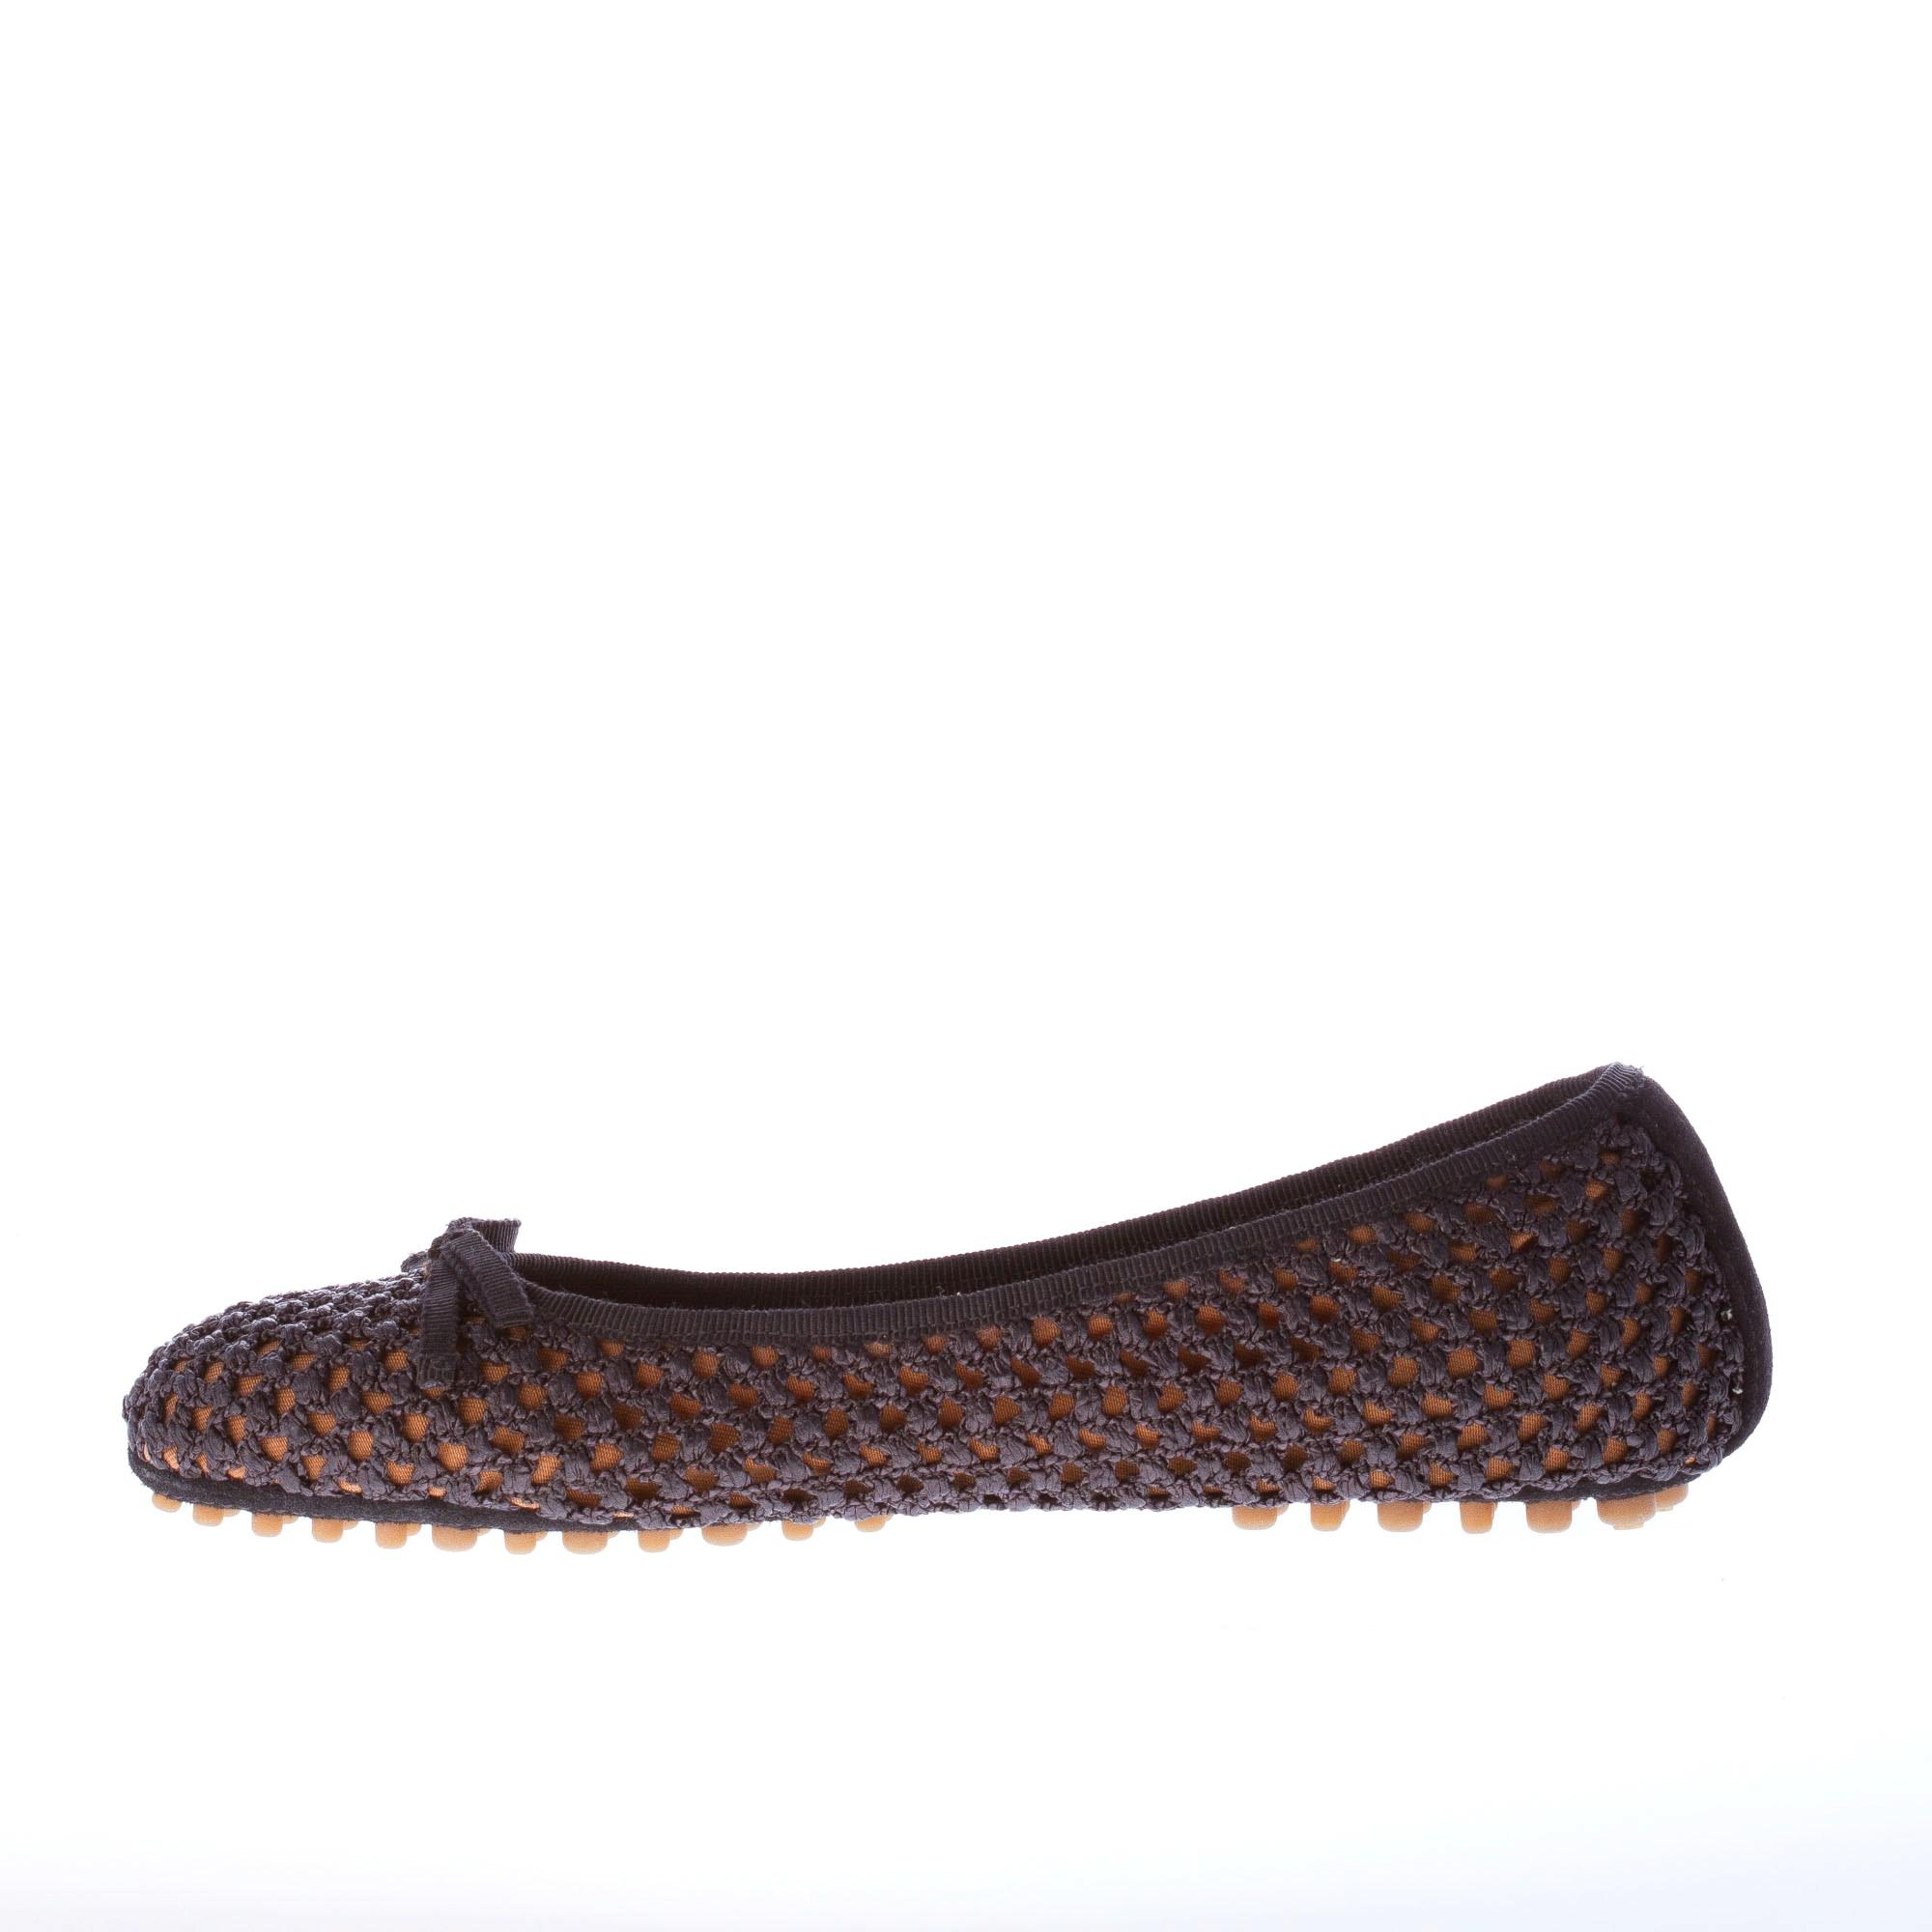 Gran descuento Descuento por tiempo limitado CAR SHOE scarpe donna shoes women shoes donna ballerina in rafia intrecciata NERO con fiocco 4bedc6